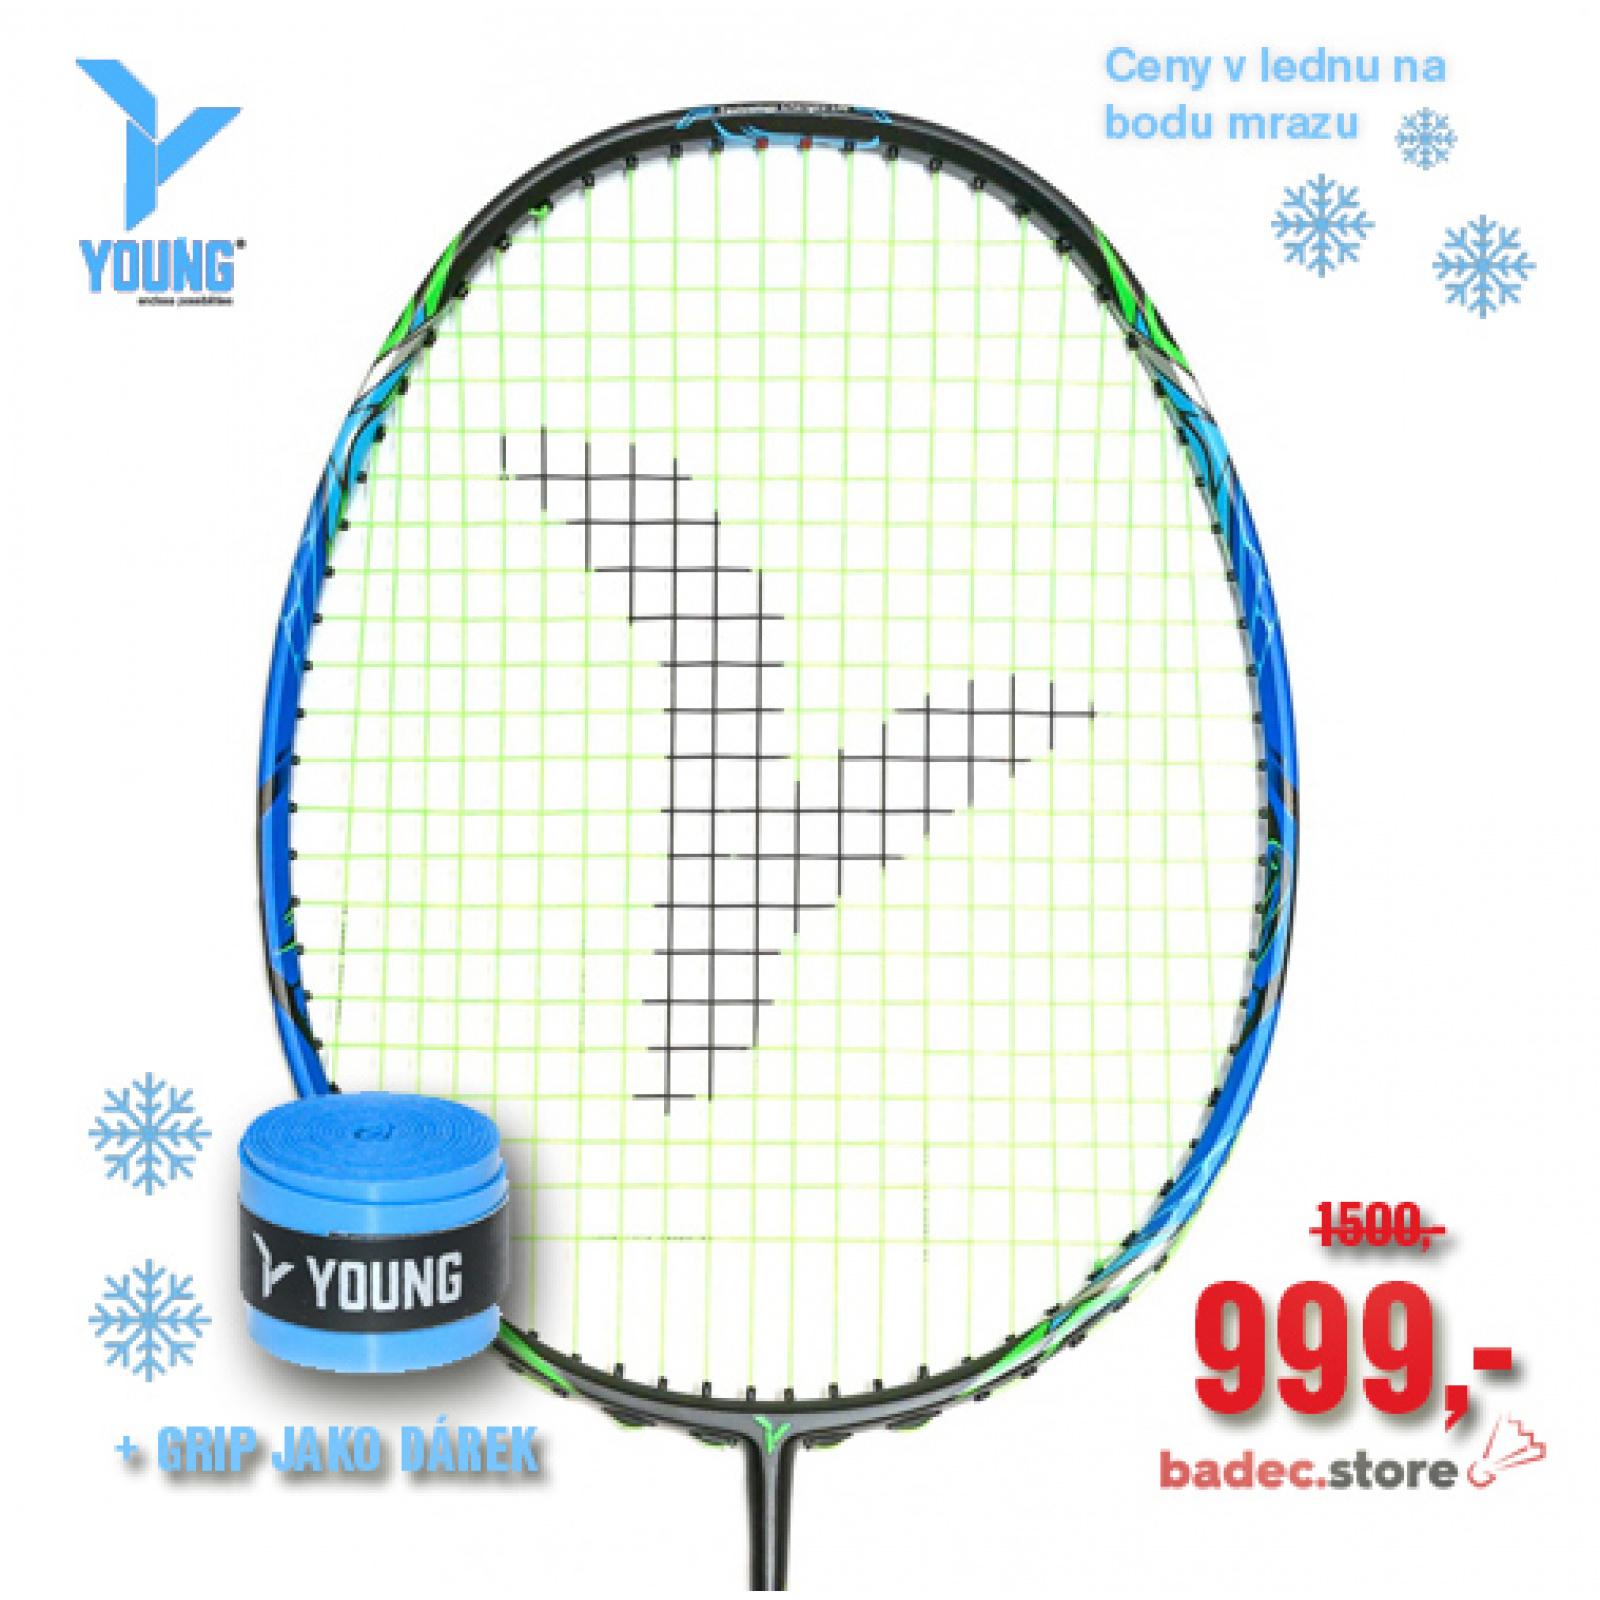 https://www.badec.store/produkty_img/badmintonova-raketa1578414691L.jpg